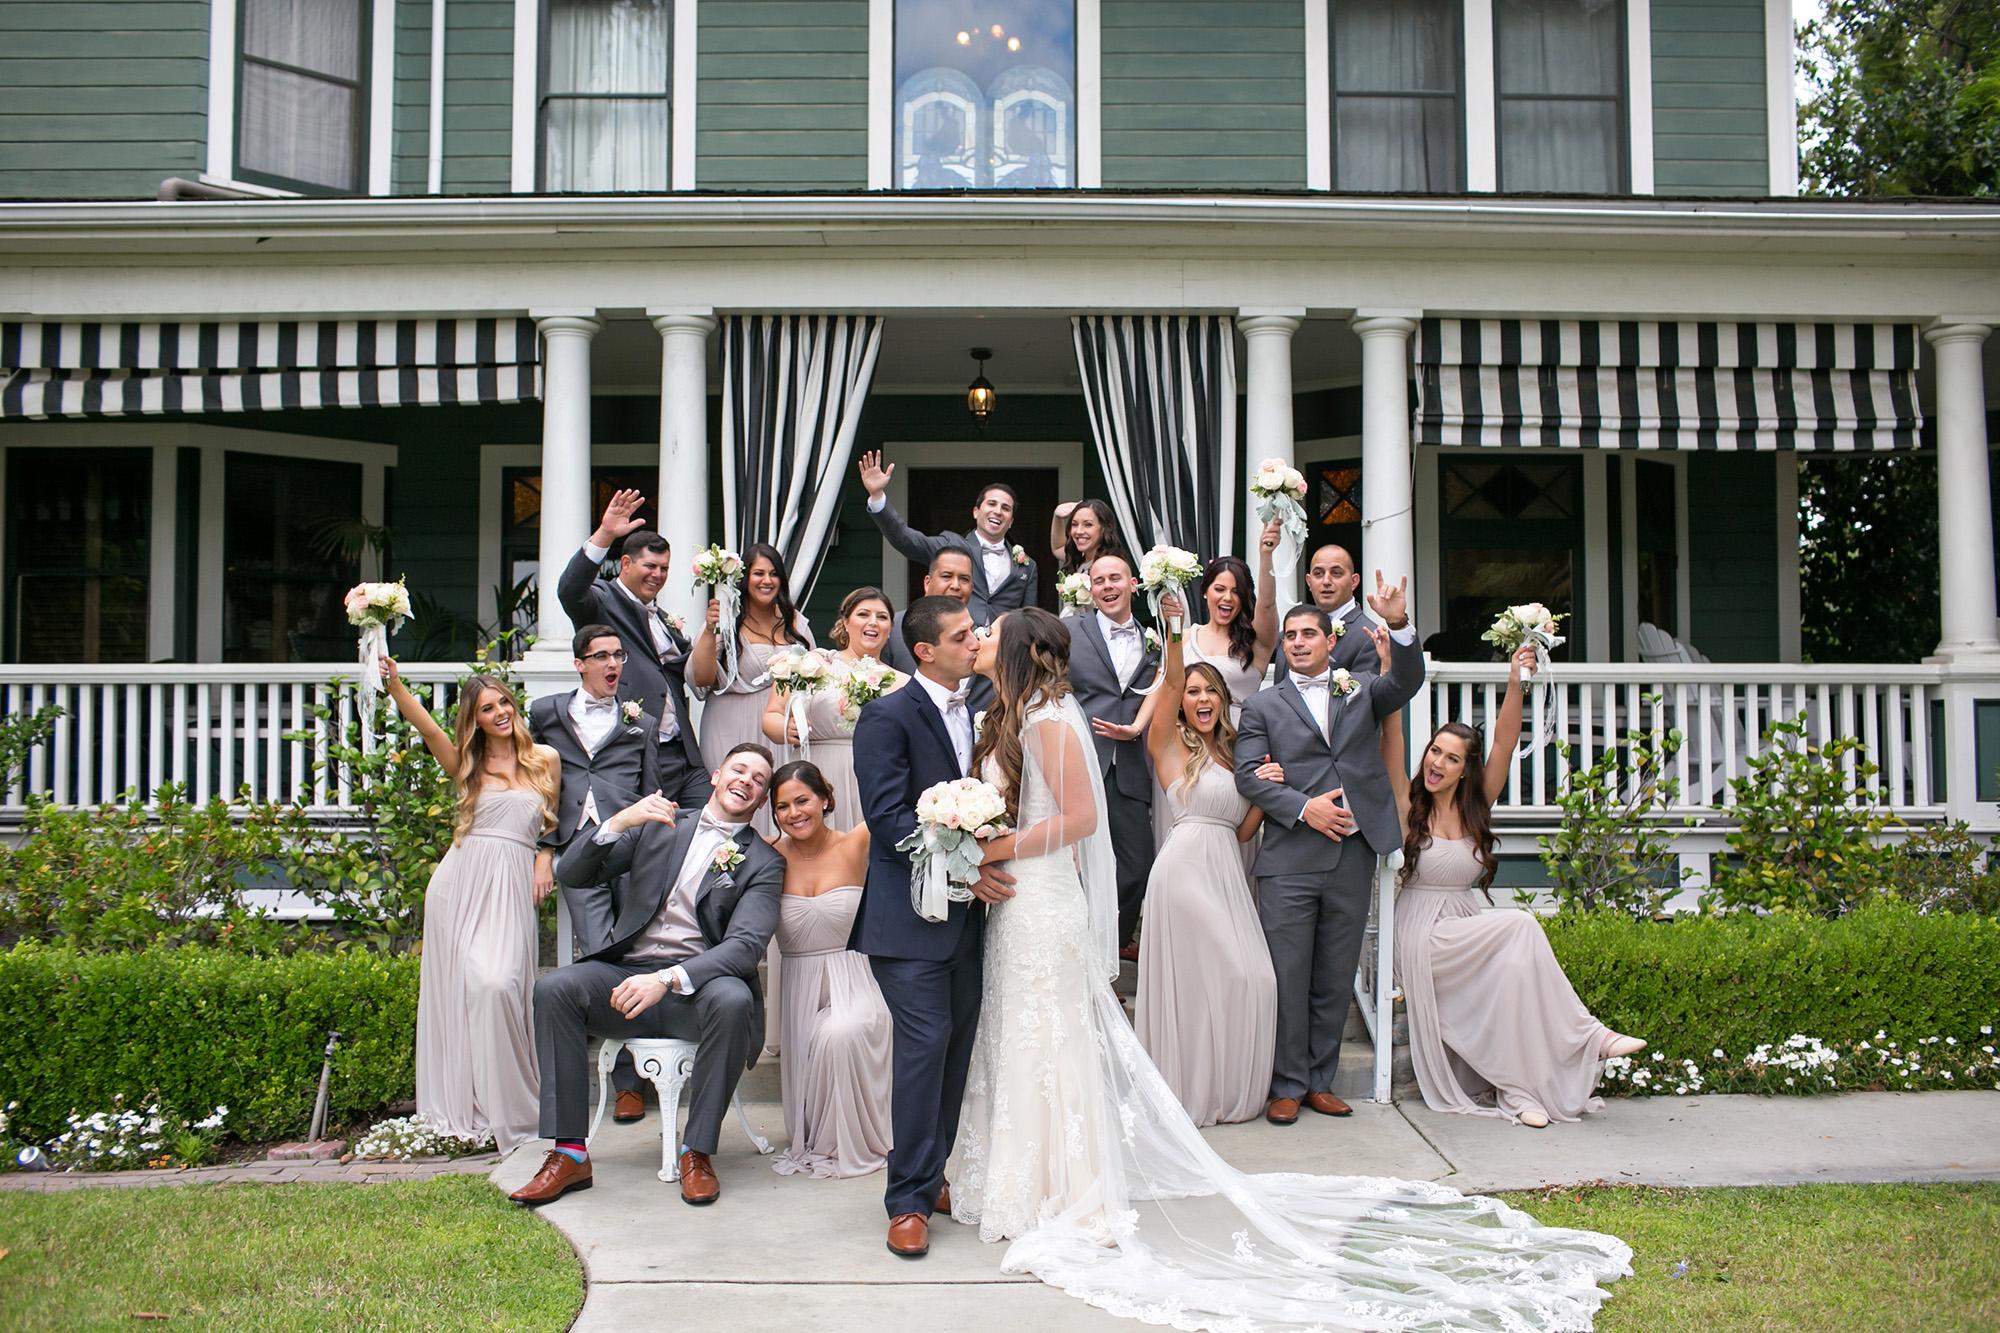 christmas-house-weddings-receptions-carrie-vines-280.jpg